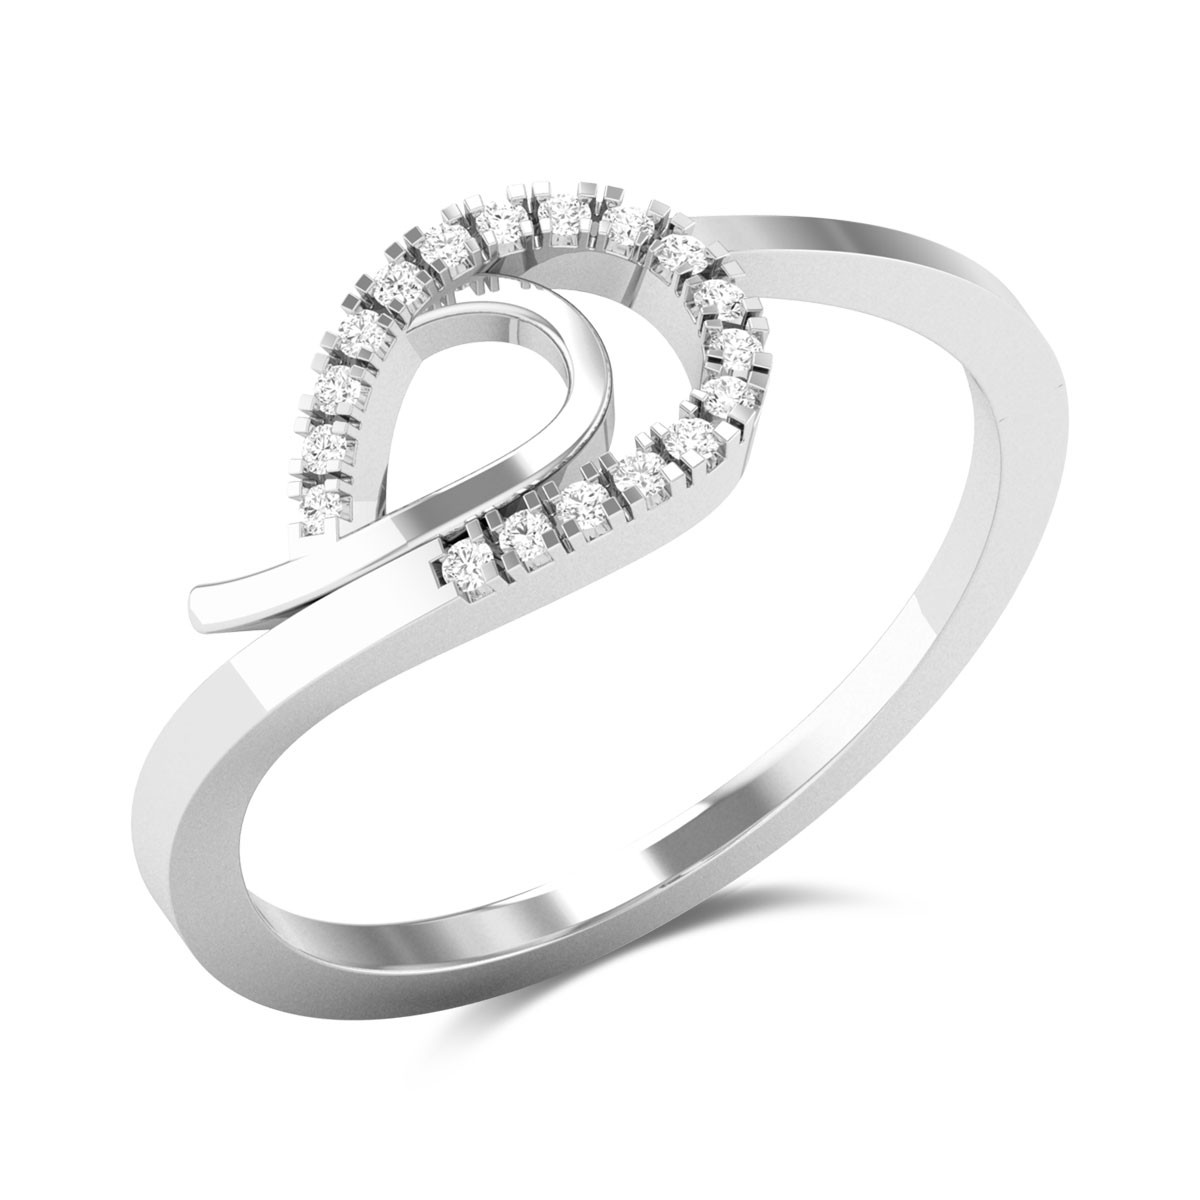 Confection Diamond Ring